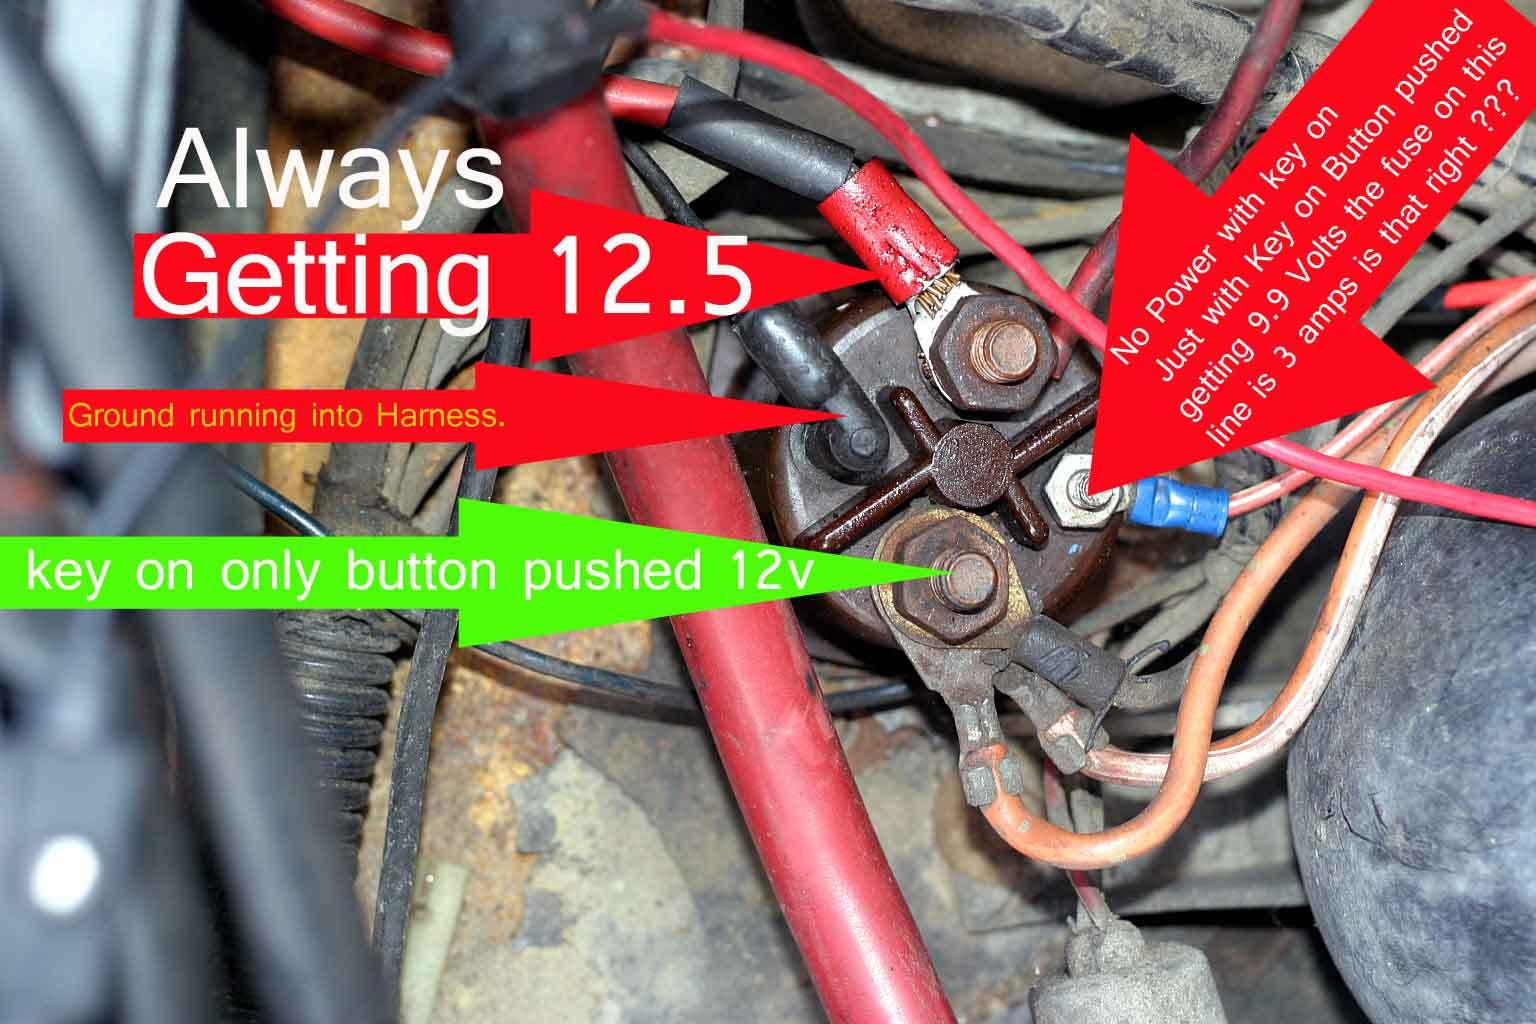 2000 F350 Powerstroke Fuse Diagram Auto Electrical Wiring Warn 76080 2001 Ford 7 3 Glow Plug Plugs F